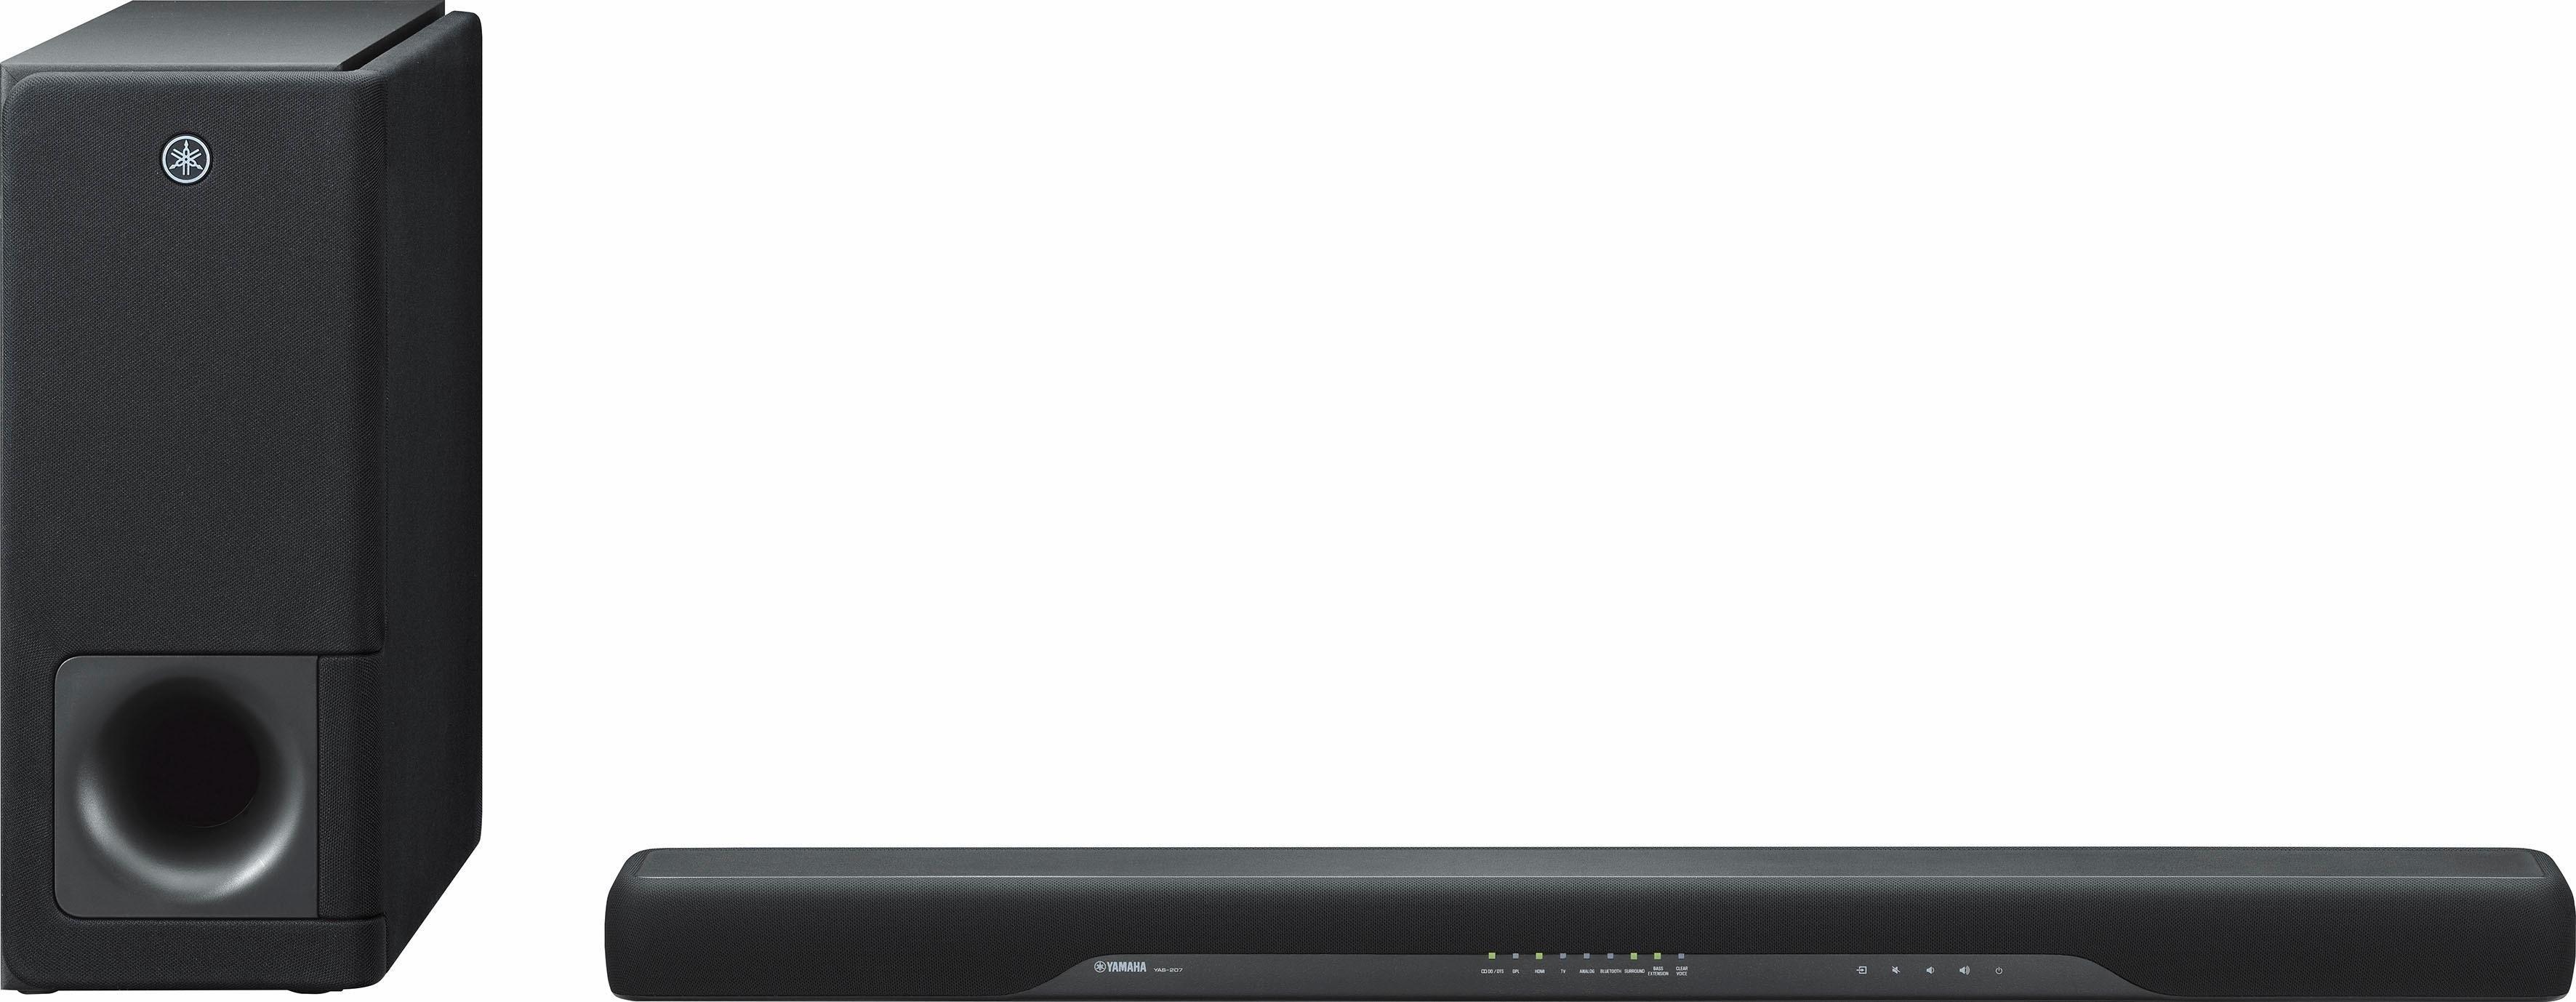 Yamaha YAS-207 soundbar met Bluetooth nu online bestellen